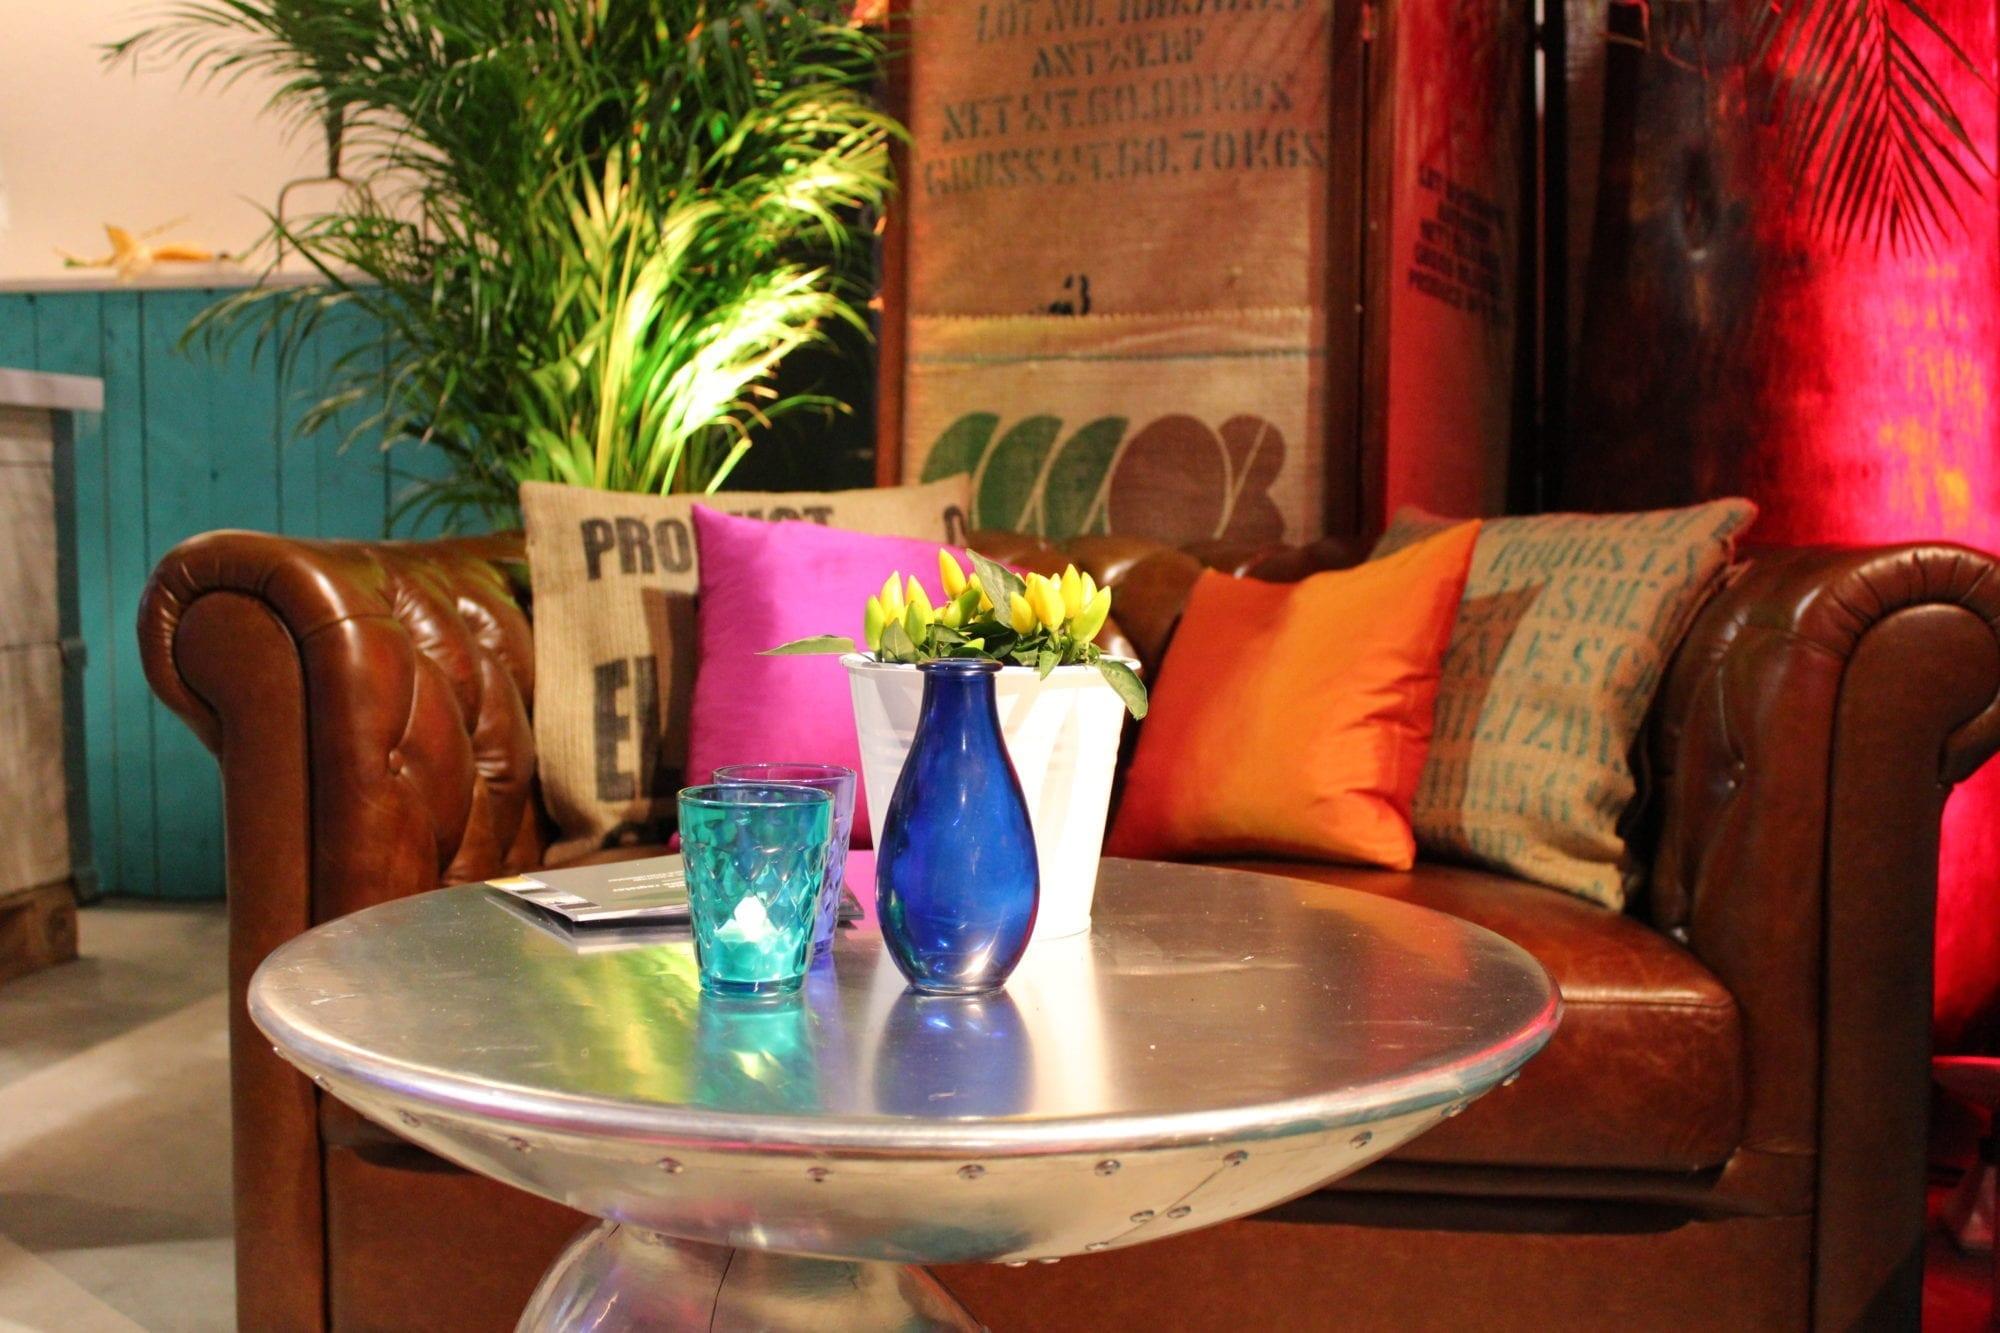 neue produkte mieten rent-a-lounge